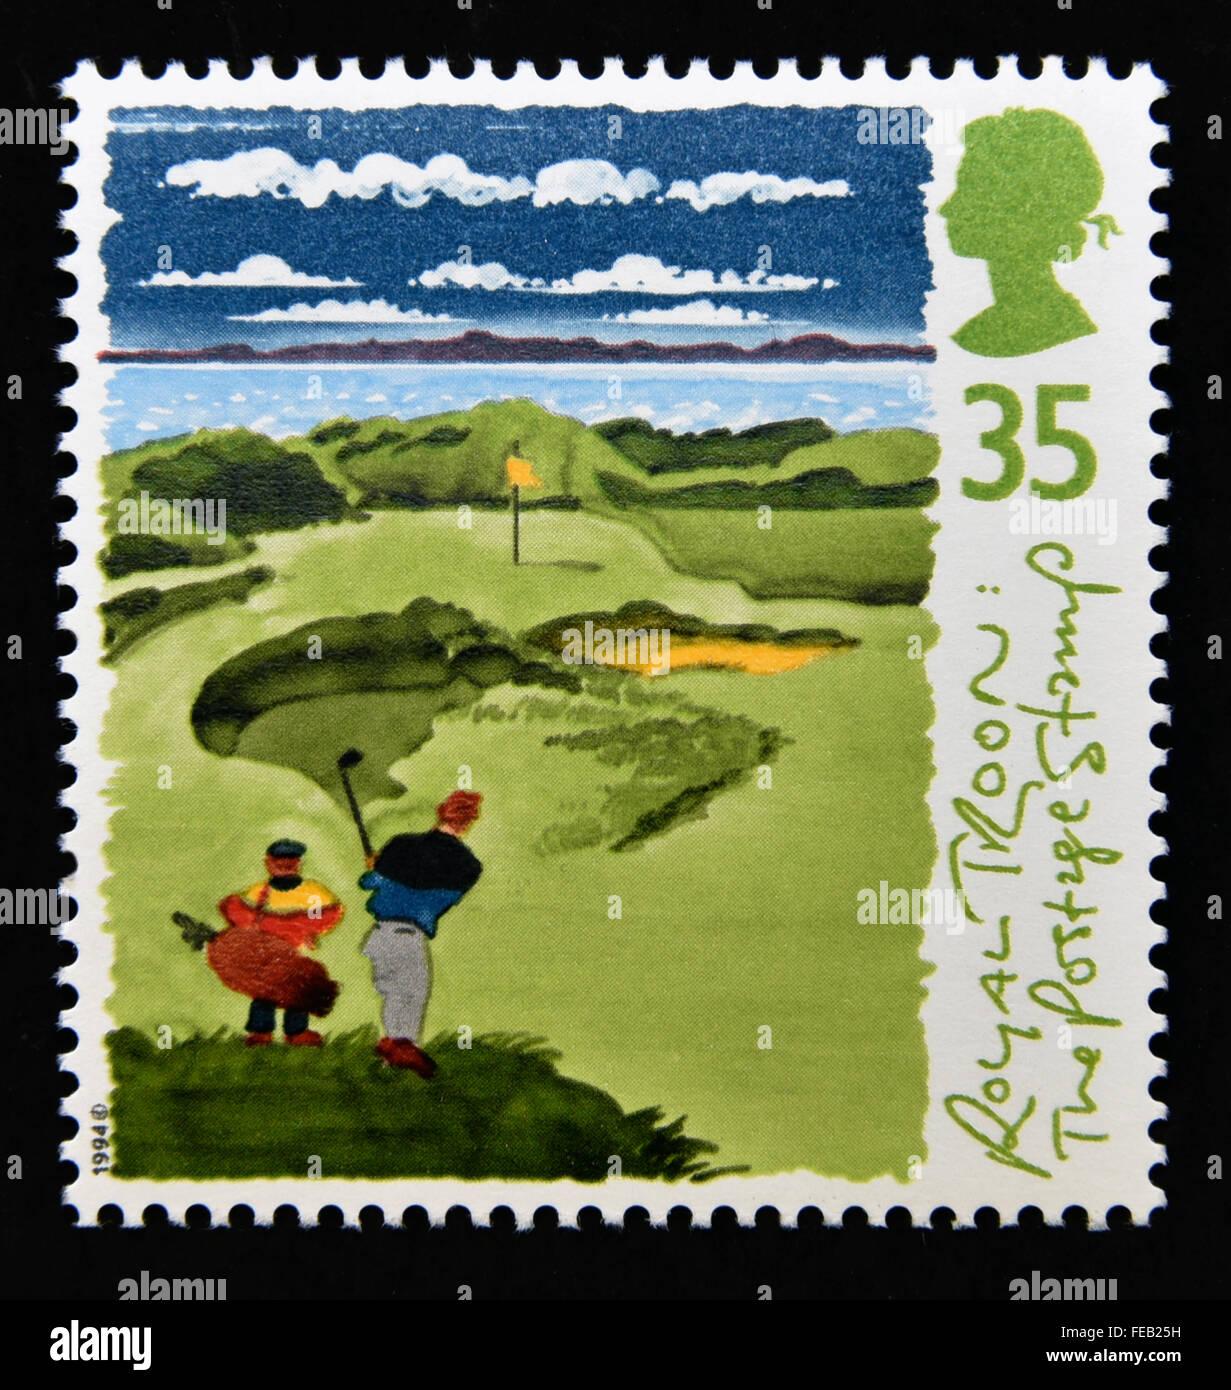 Postage stamp. Great Britain. Queen Elizabeth II. 1994. Scottish Golf Courses. 35p. Stock Photo